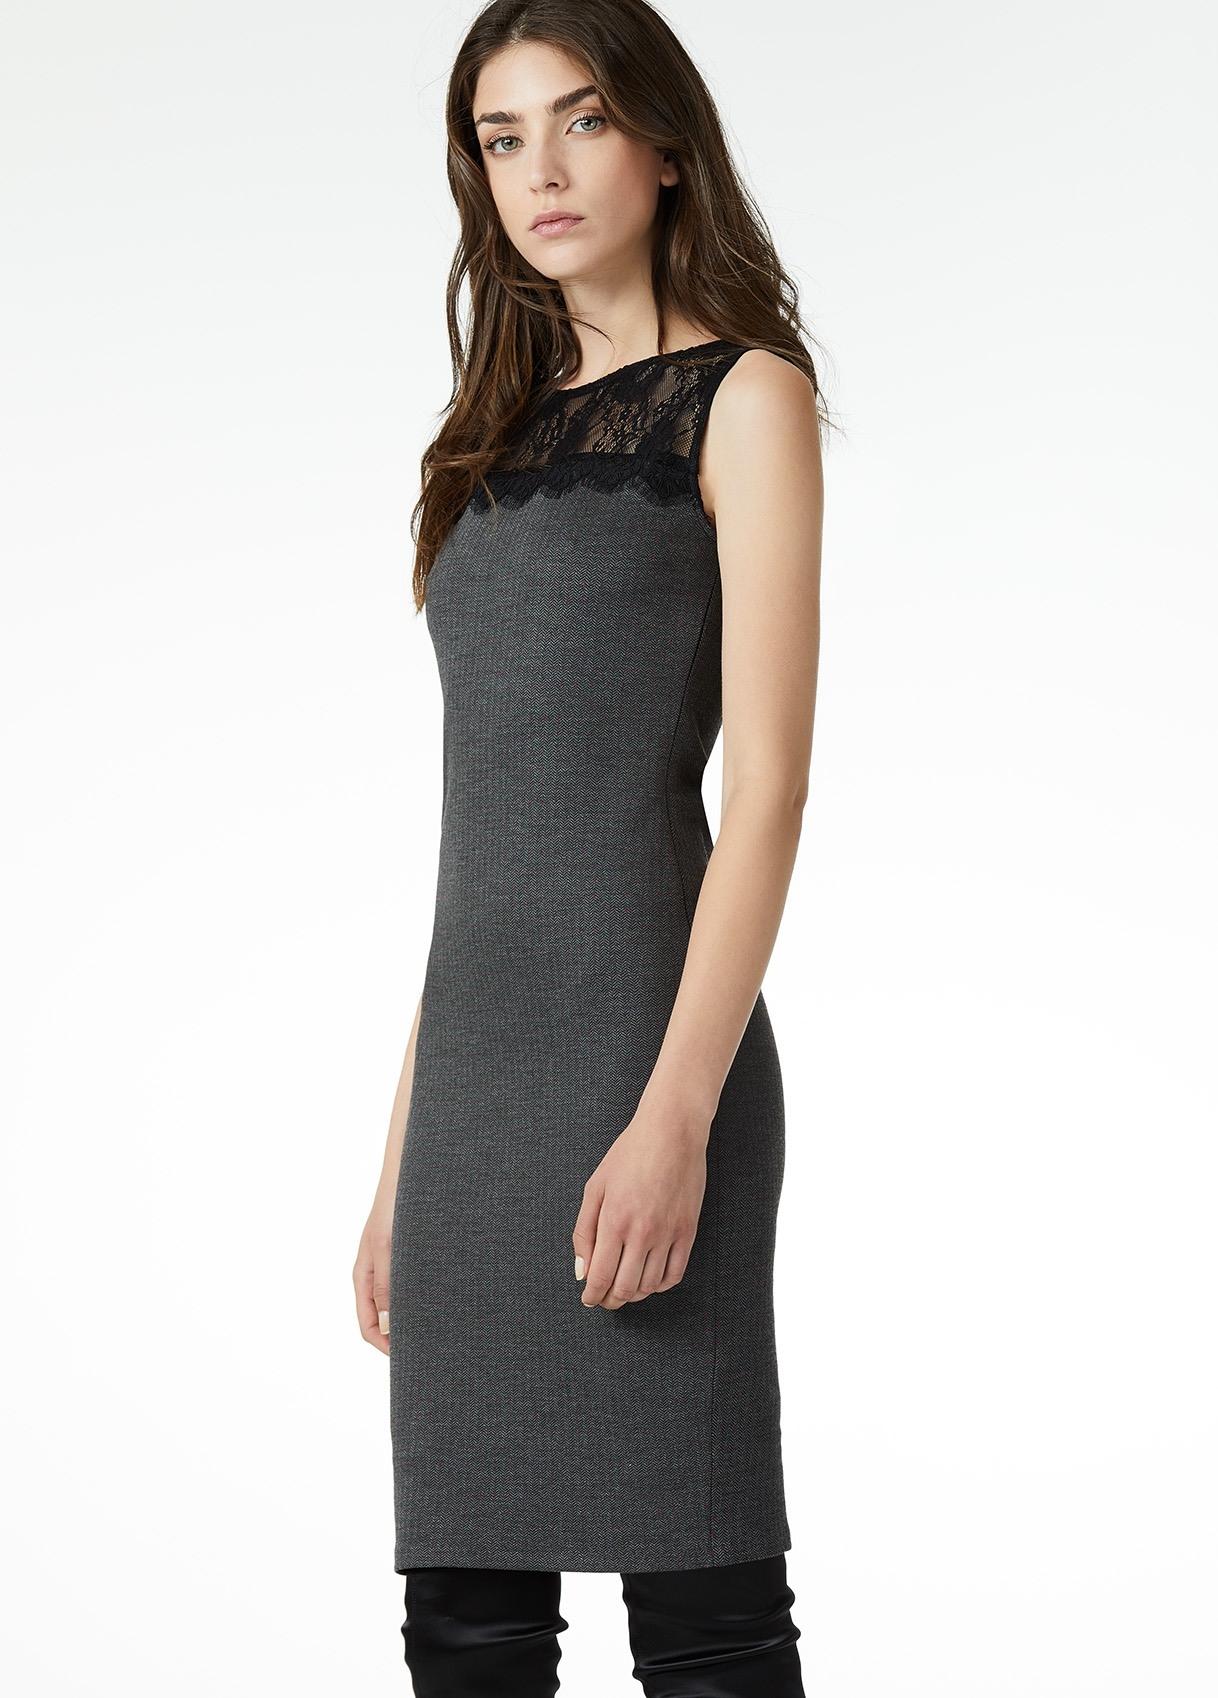 Kreativ Kleid Eng VertriebAbend Cool Kleid Eng Spezialgebiet